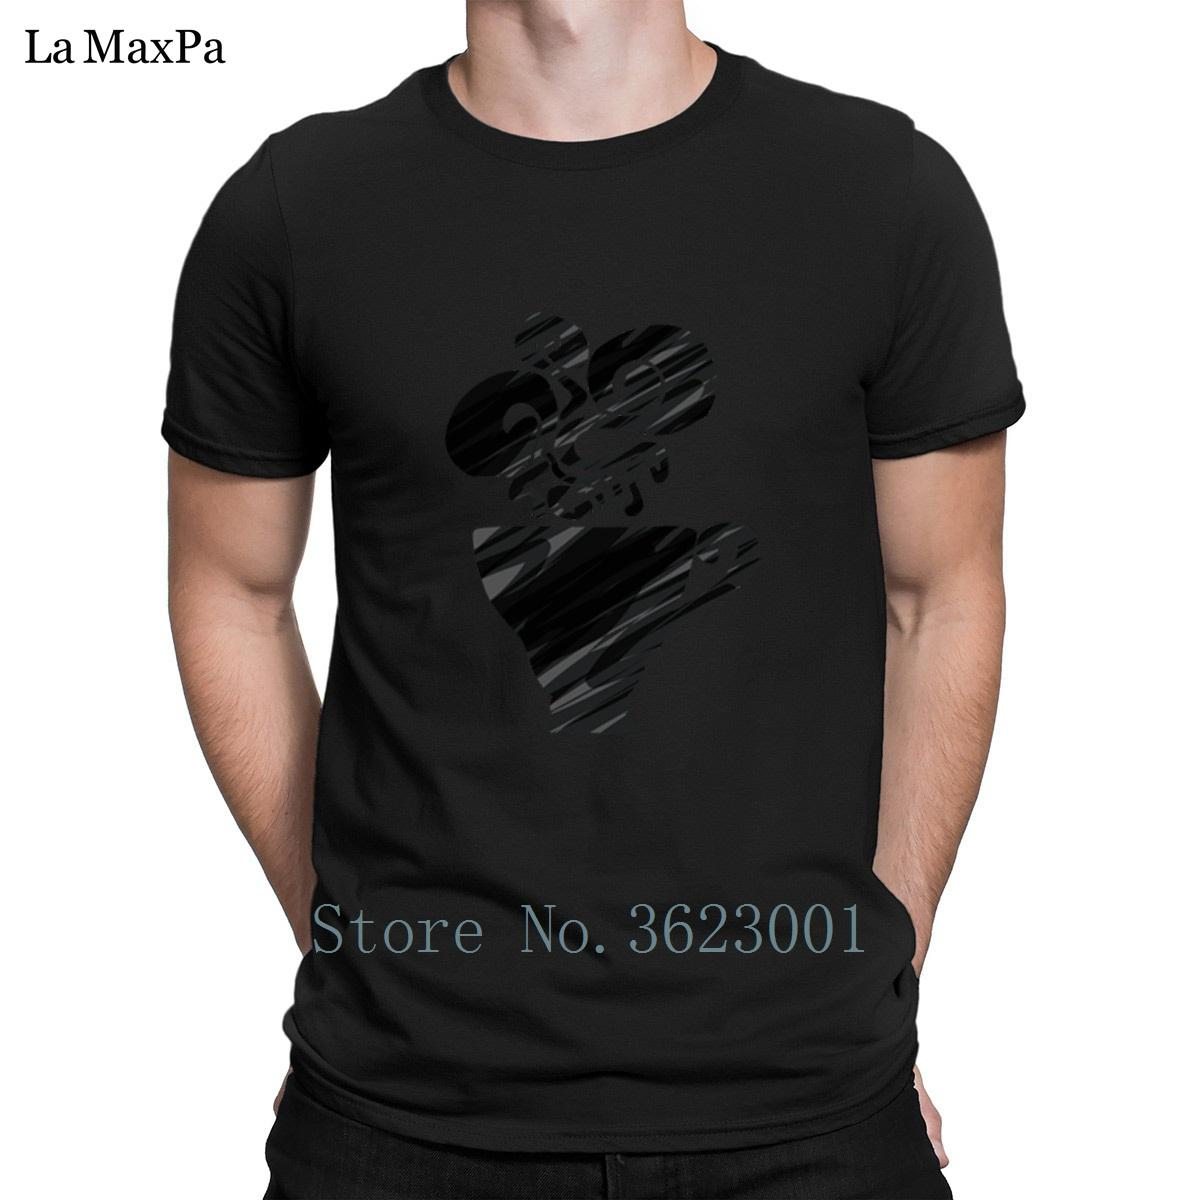 T Shirt Schwarzer Sie Herren Tee Klassische Großhandel Erstellen vnzIqxXwU